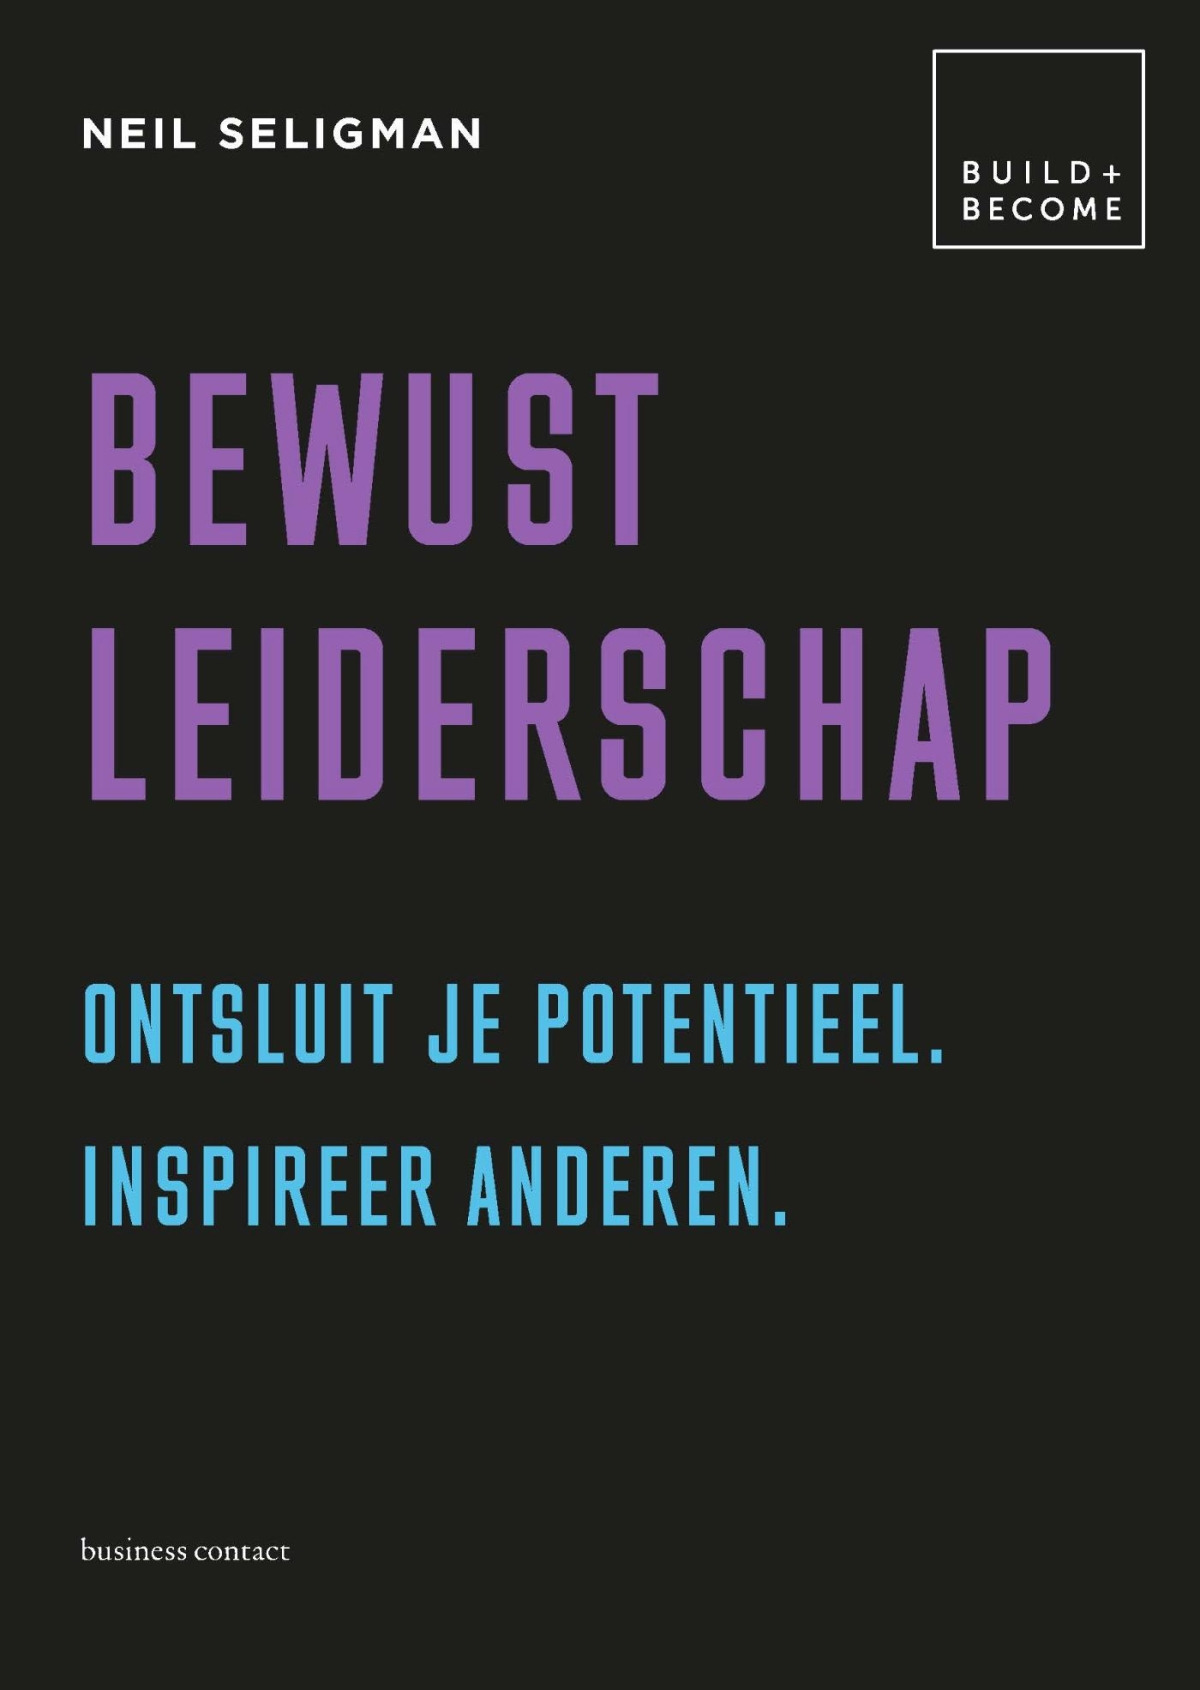 Bewust leiderschap - Neil Seligman